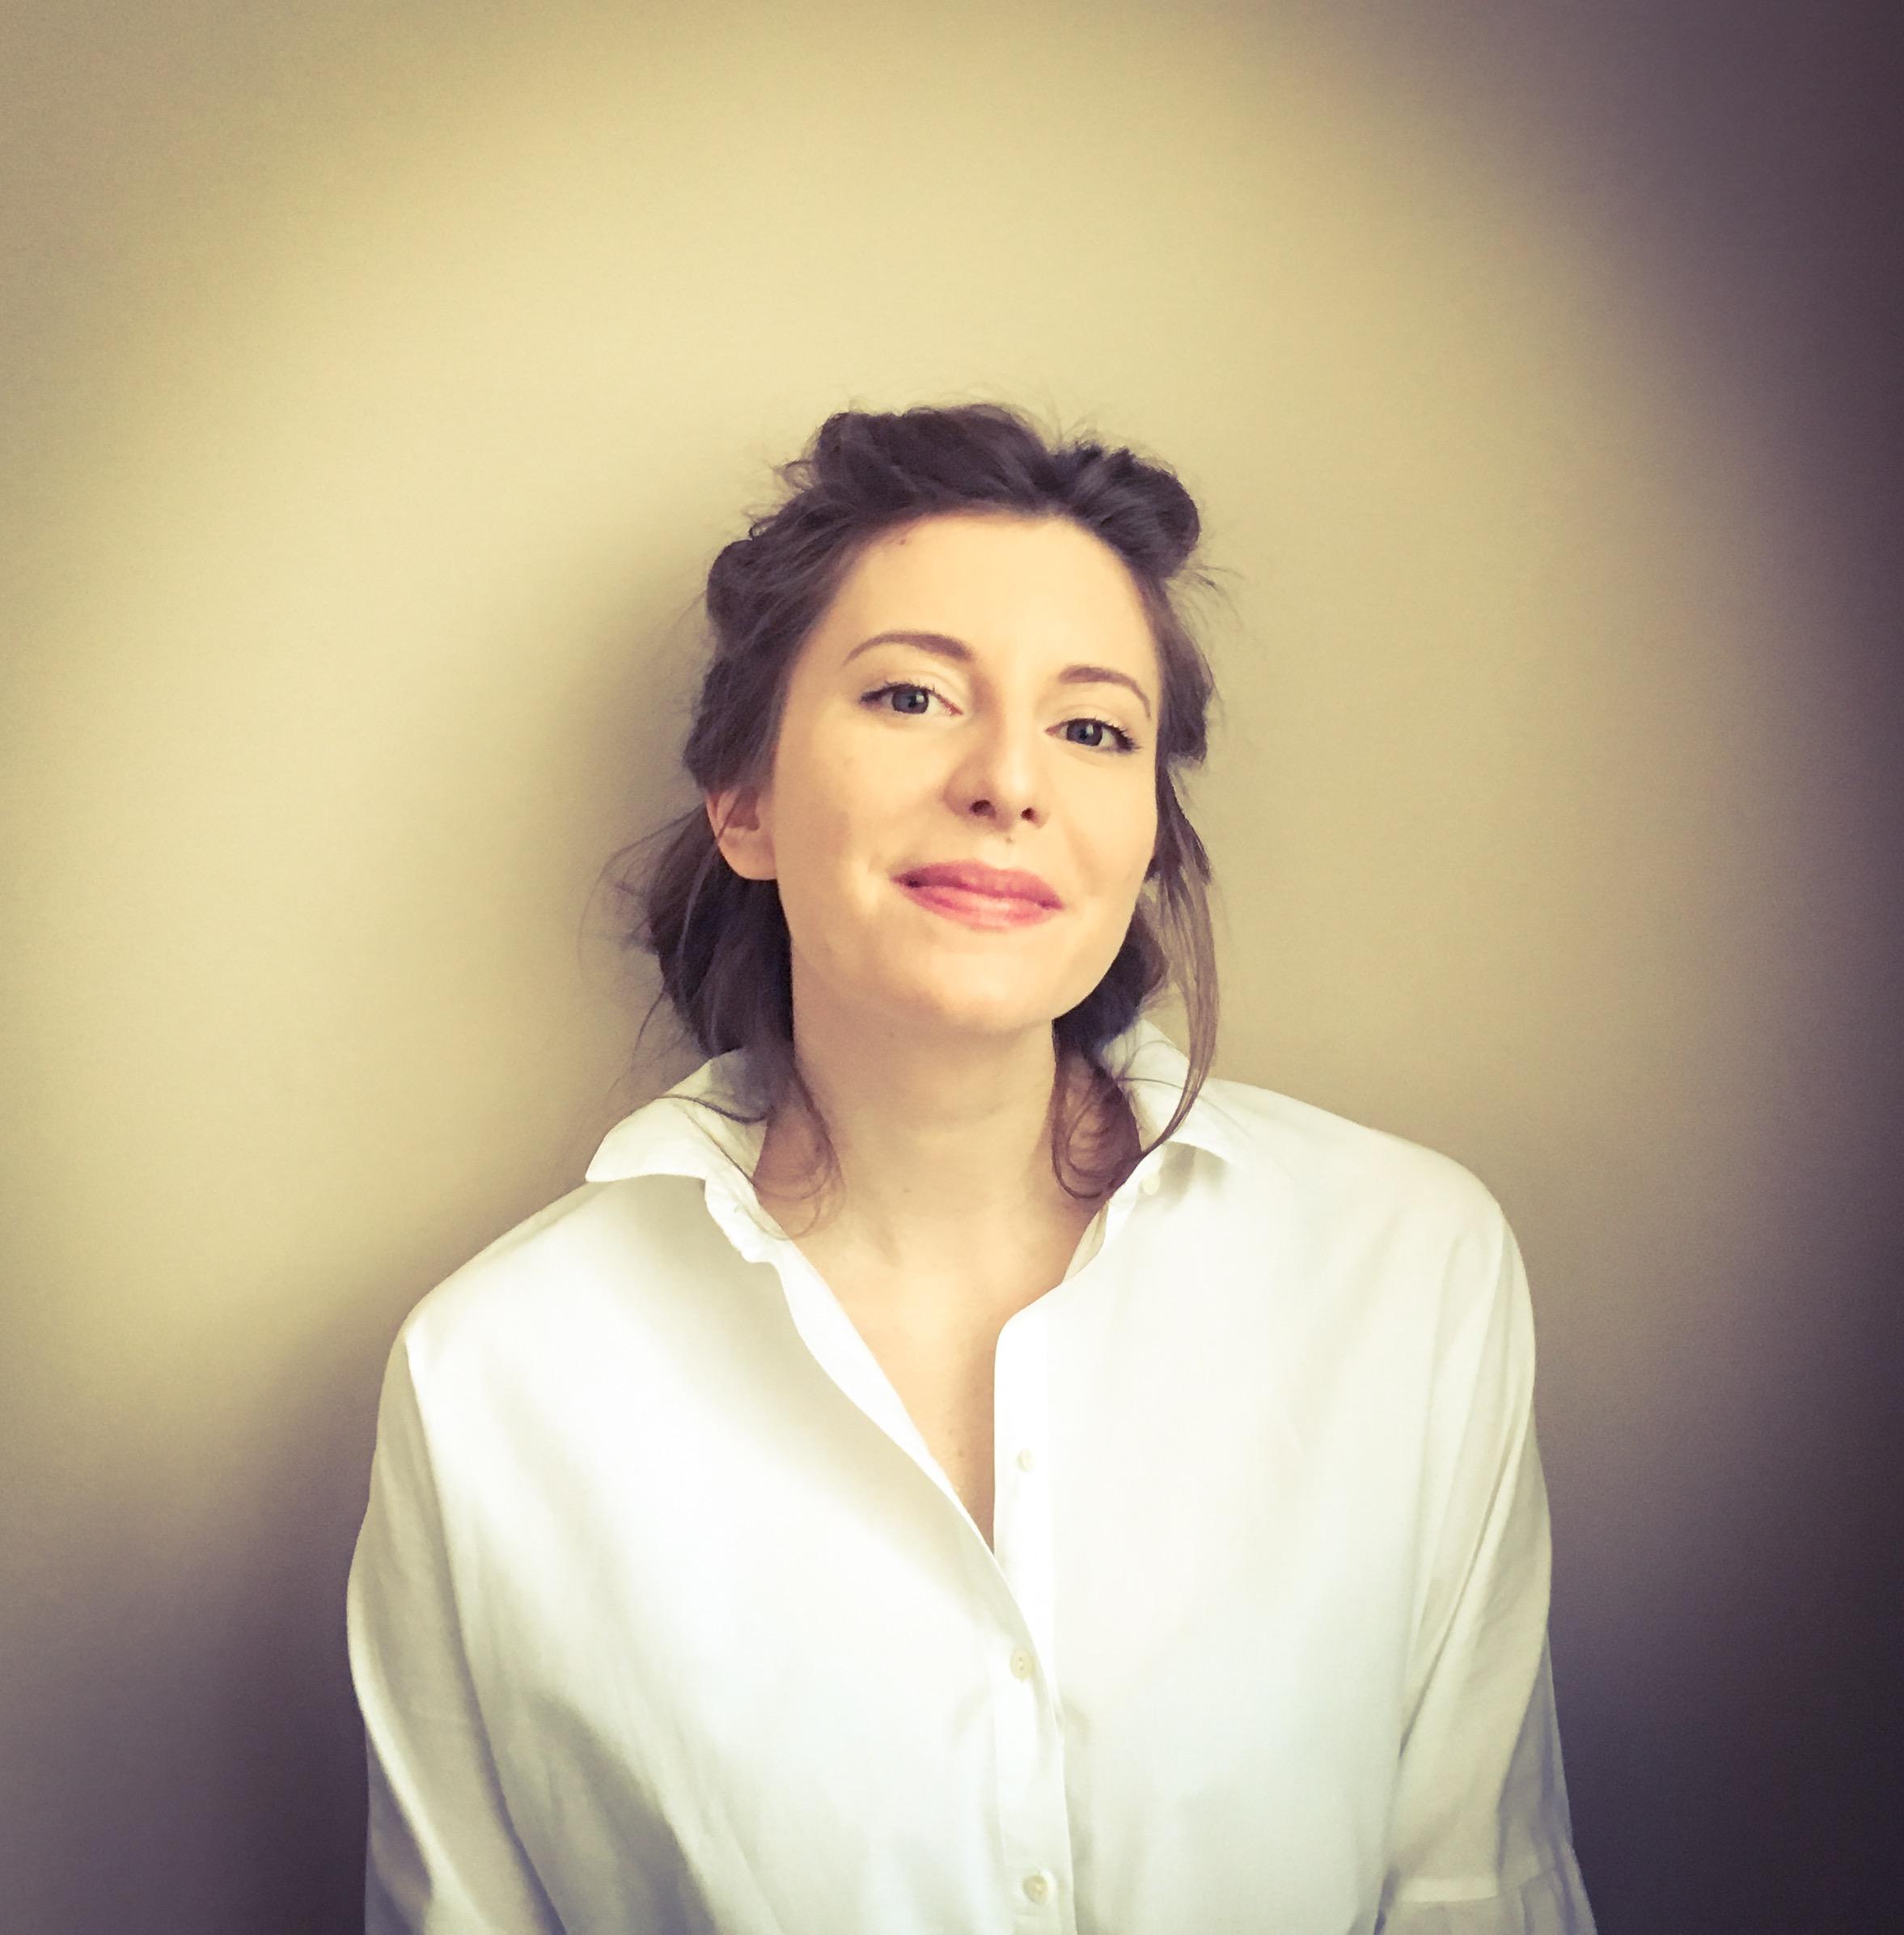 Katarzyna Głogowska IQ ART Agencja Aktorska (10)